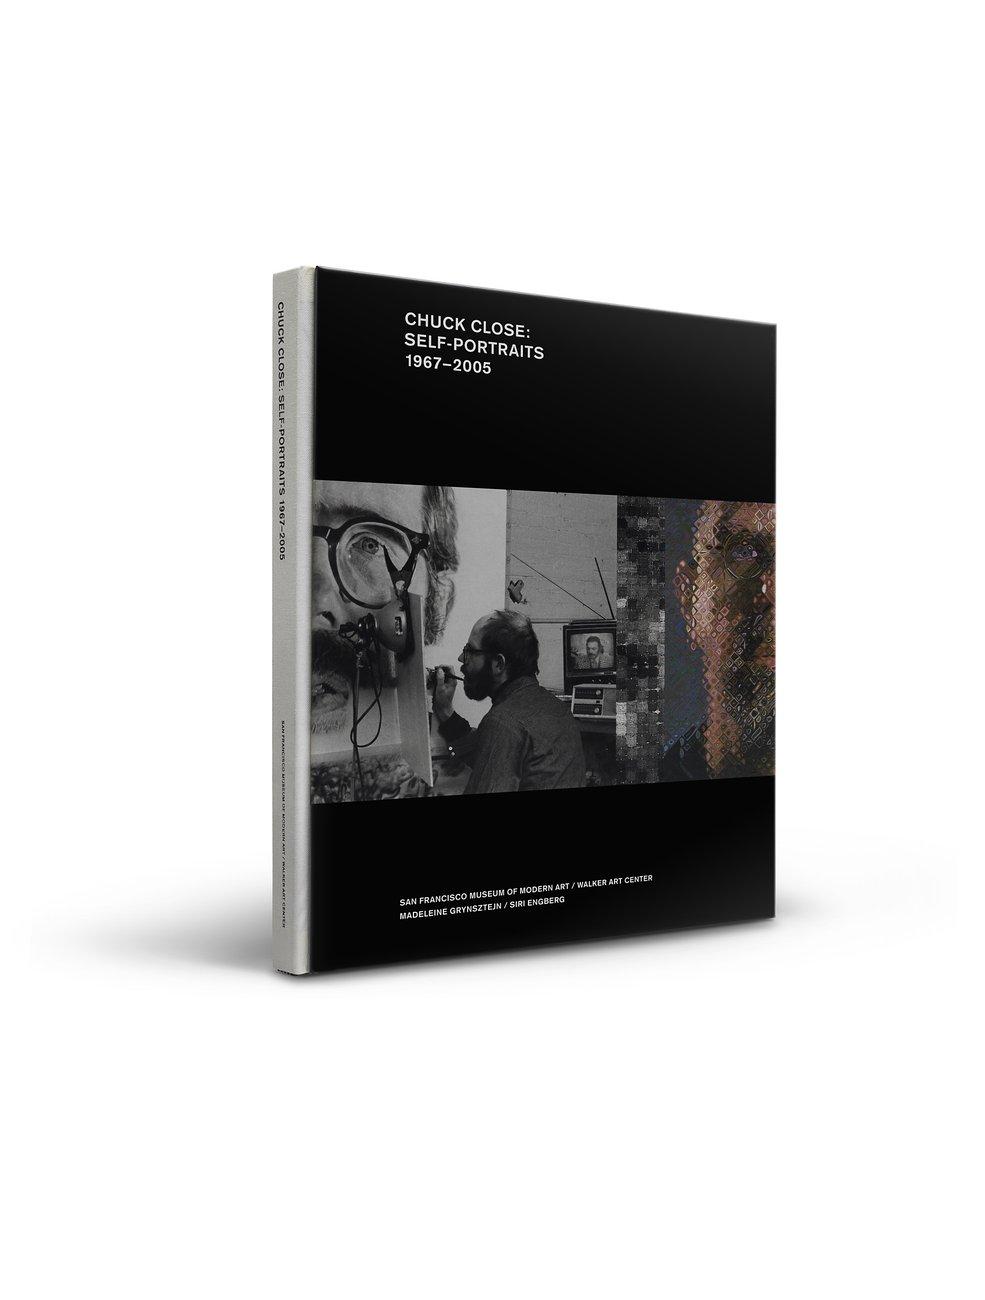 Chuck Close: Self-Portraits publication cover